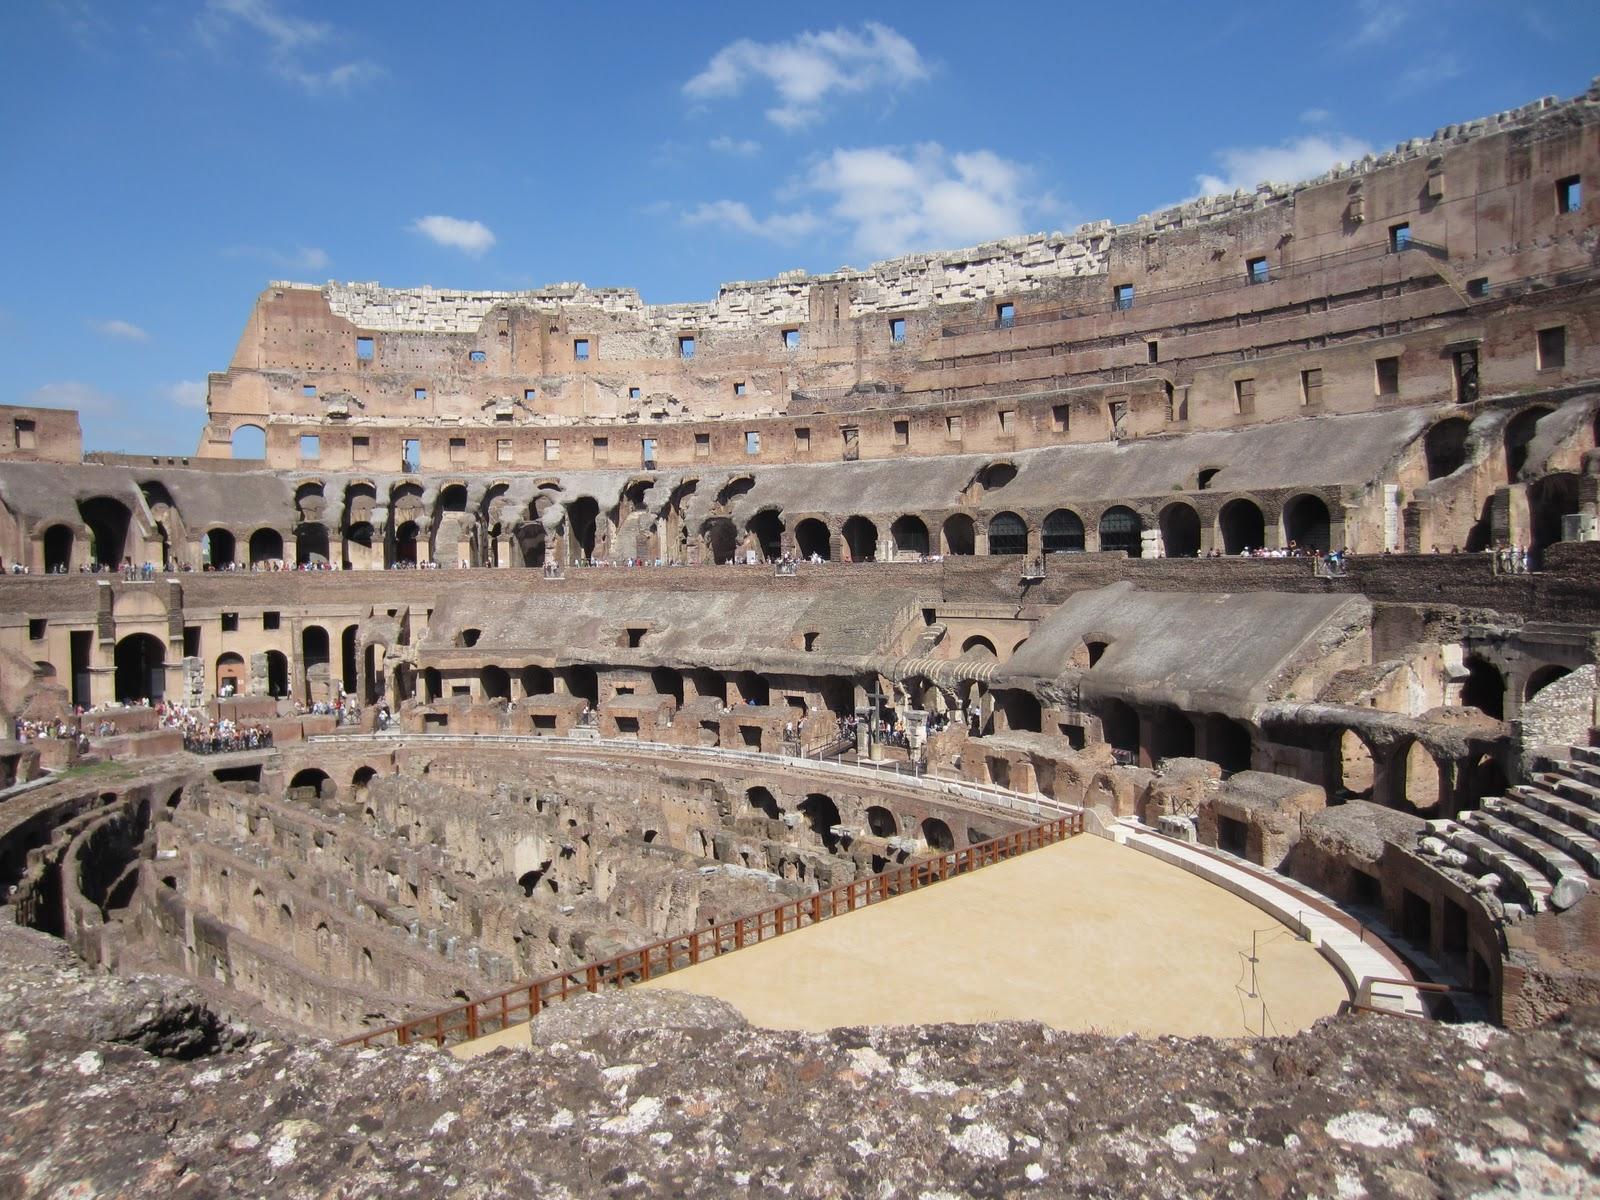 Colosseum | Reis naar Rome